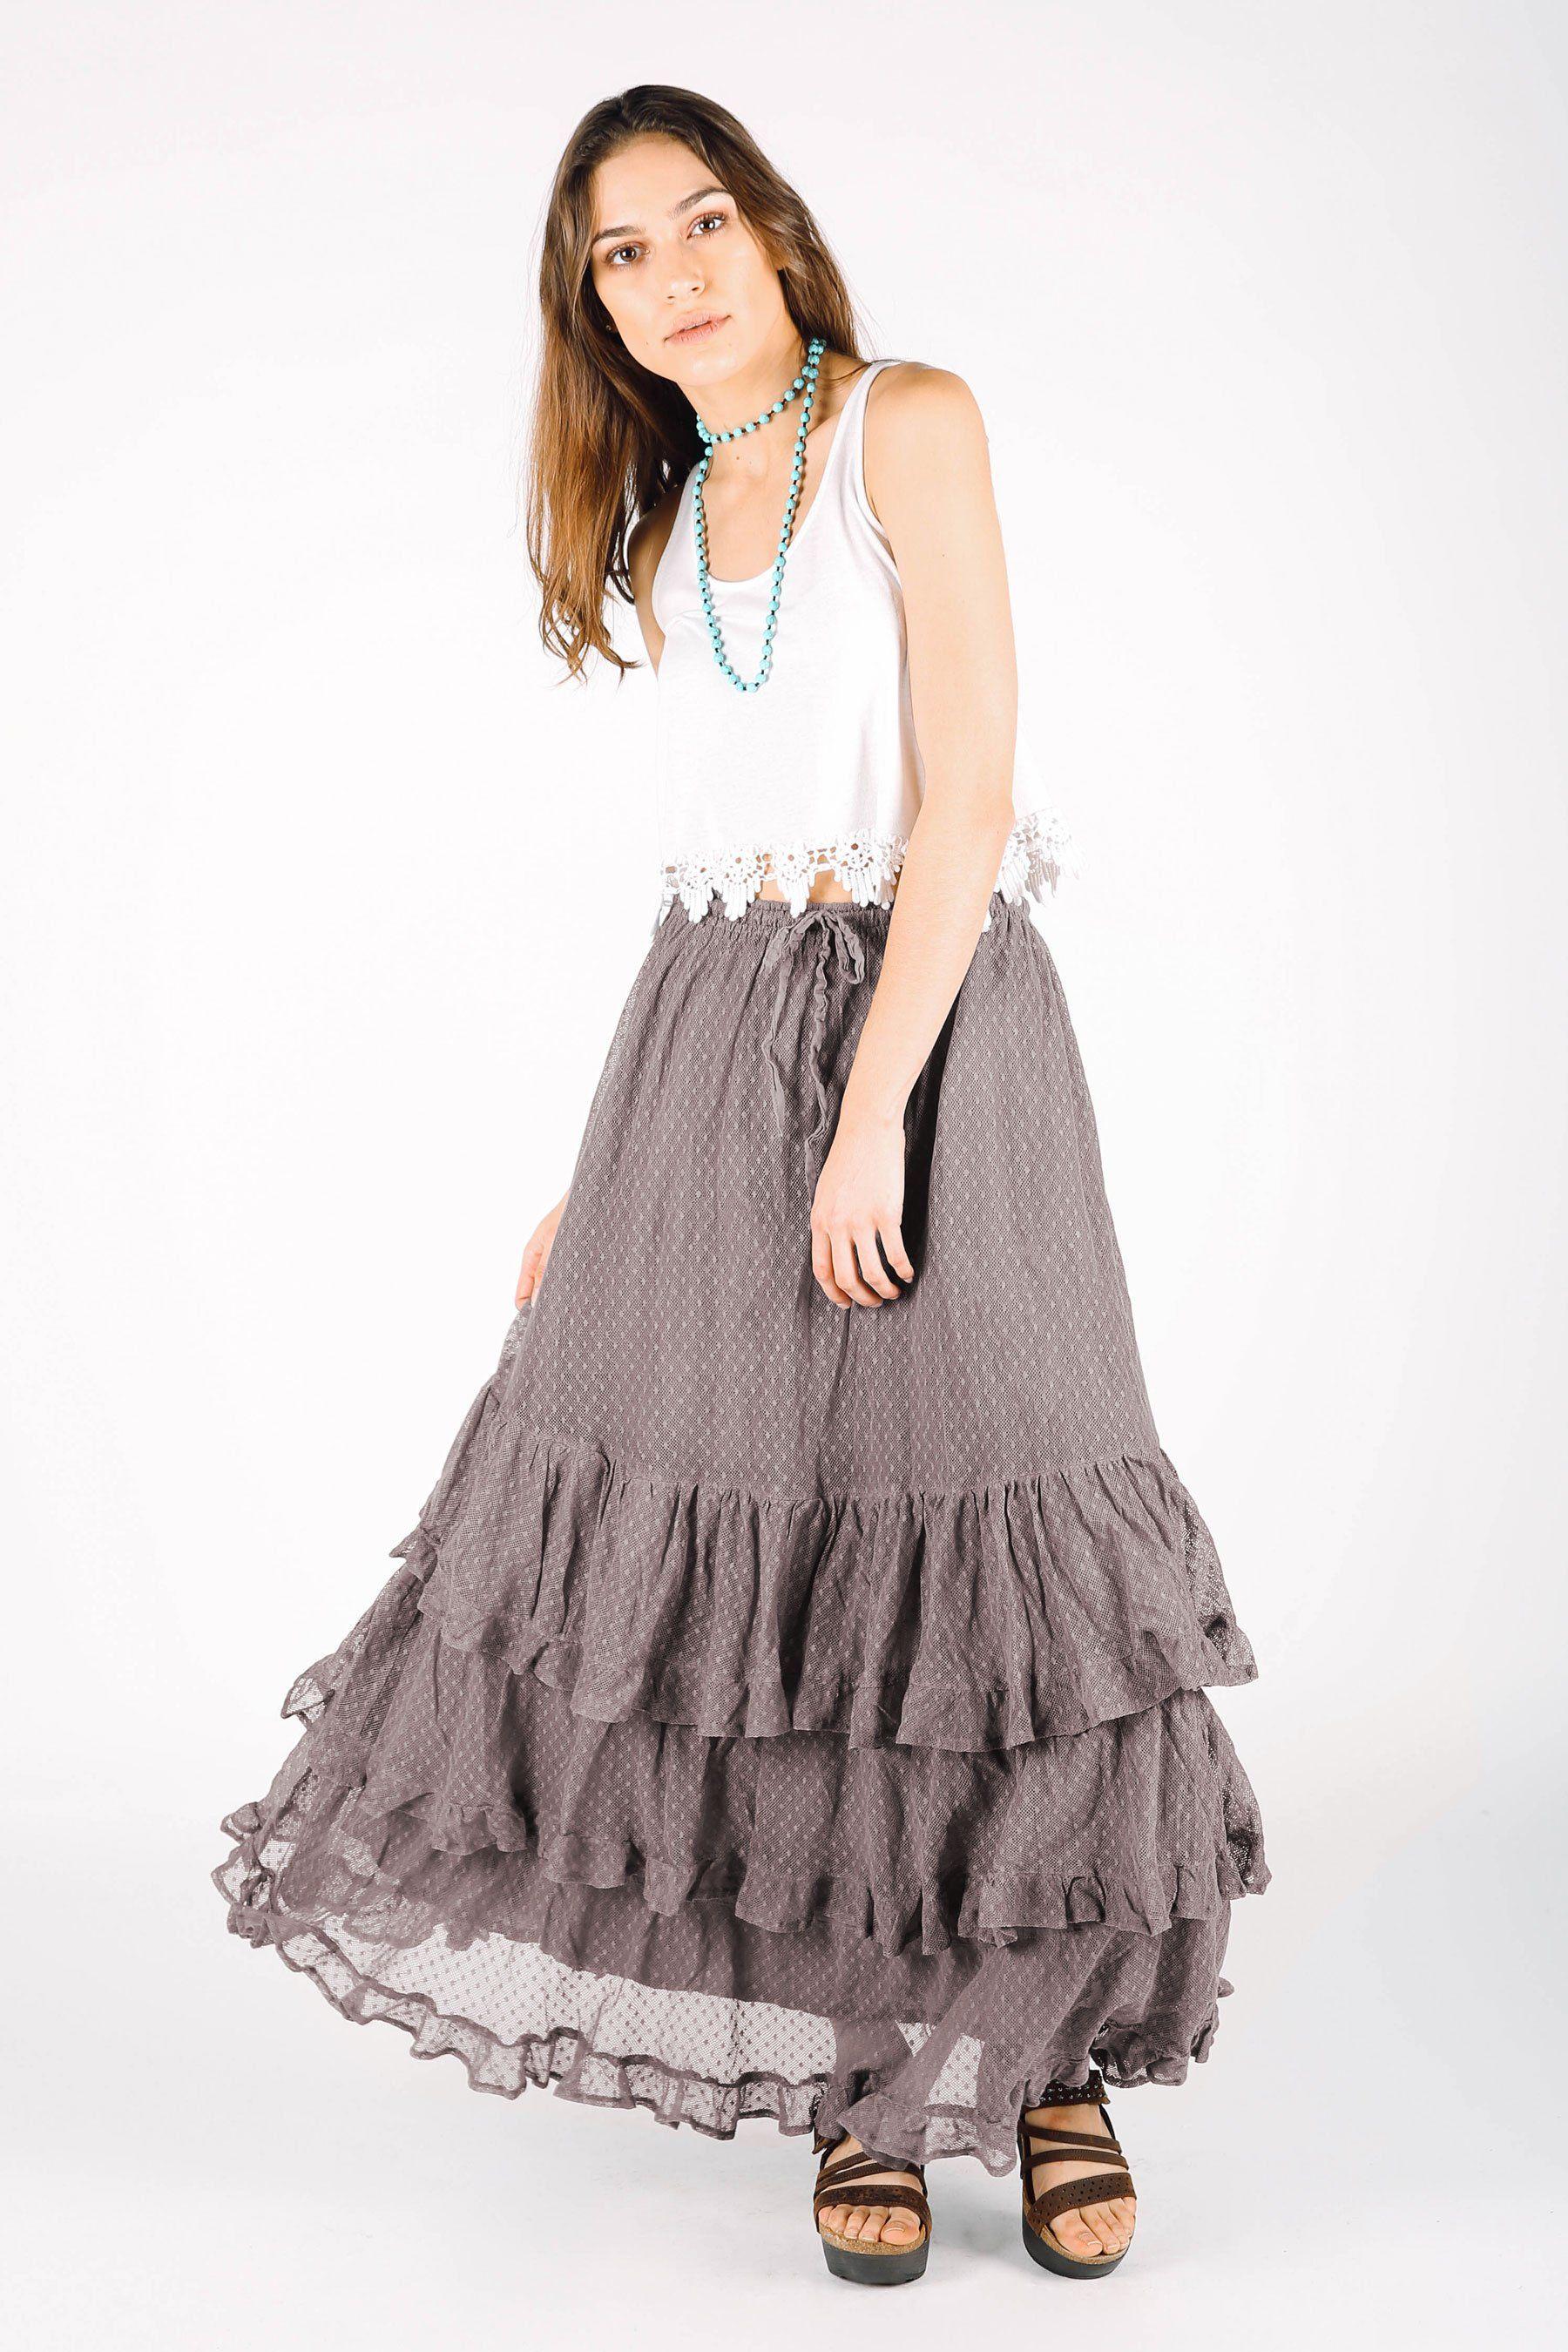 Petticoat cotton net brownhd b in undergarments